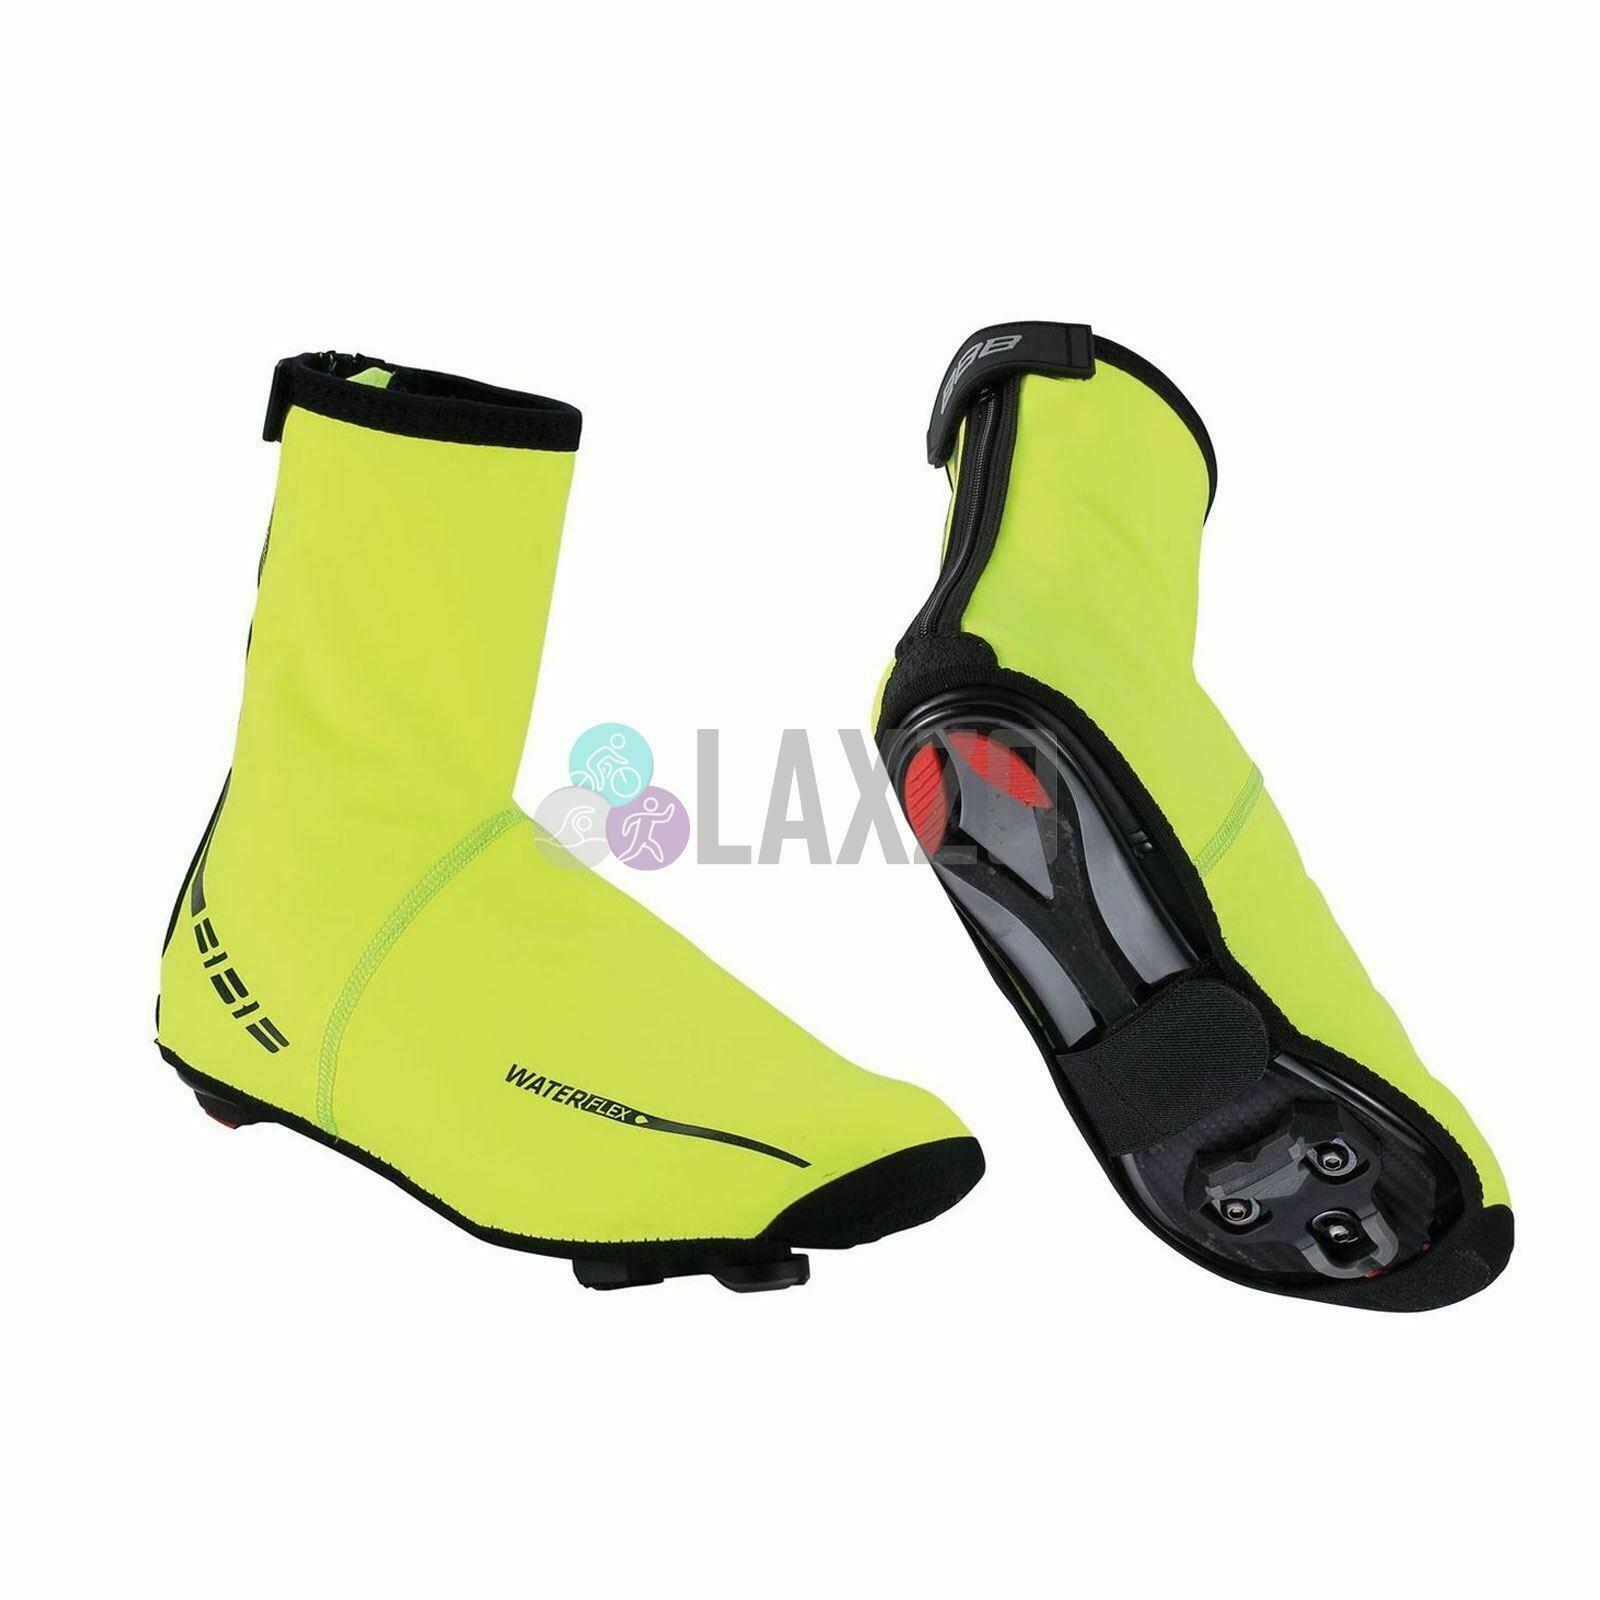 Wasser Flex Überschuhe Pu Gummi Innen Microfleece Ykk-Zipper Neon Gelb 47-48